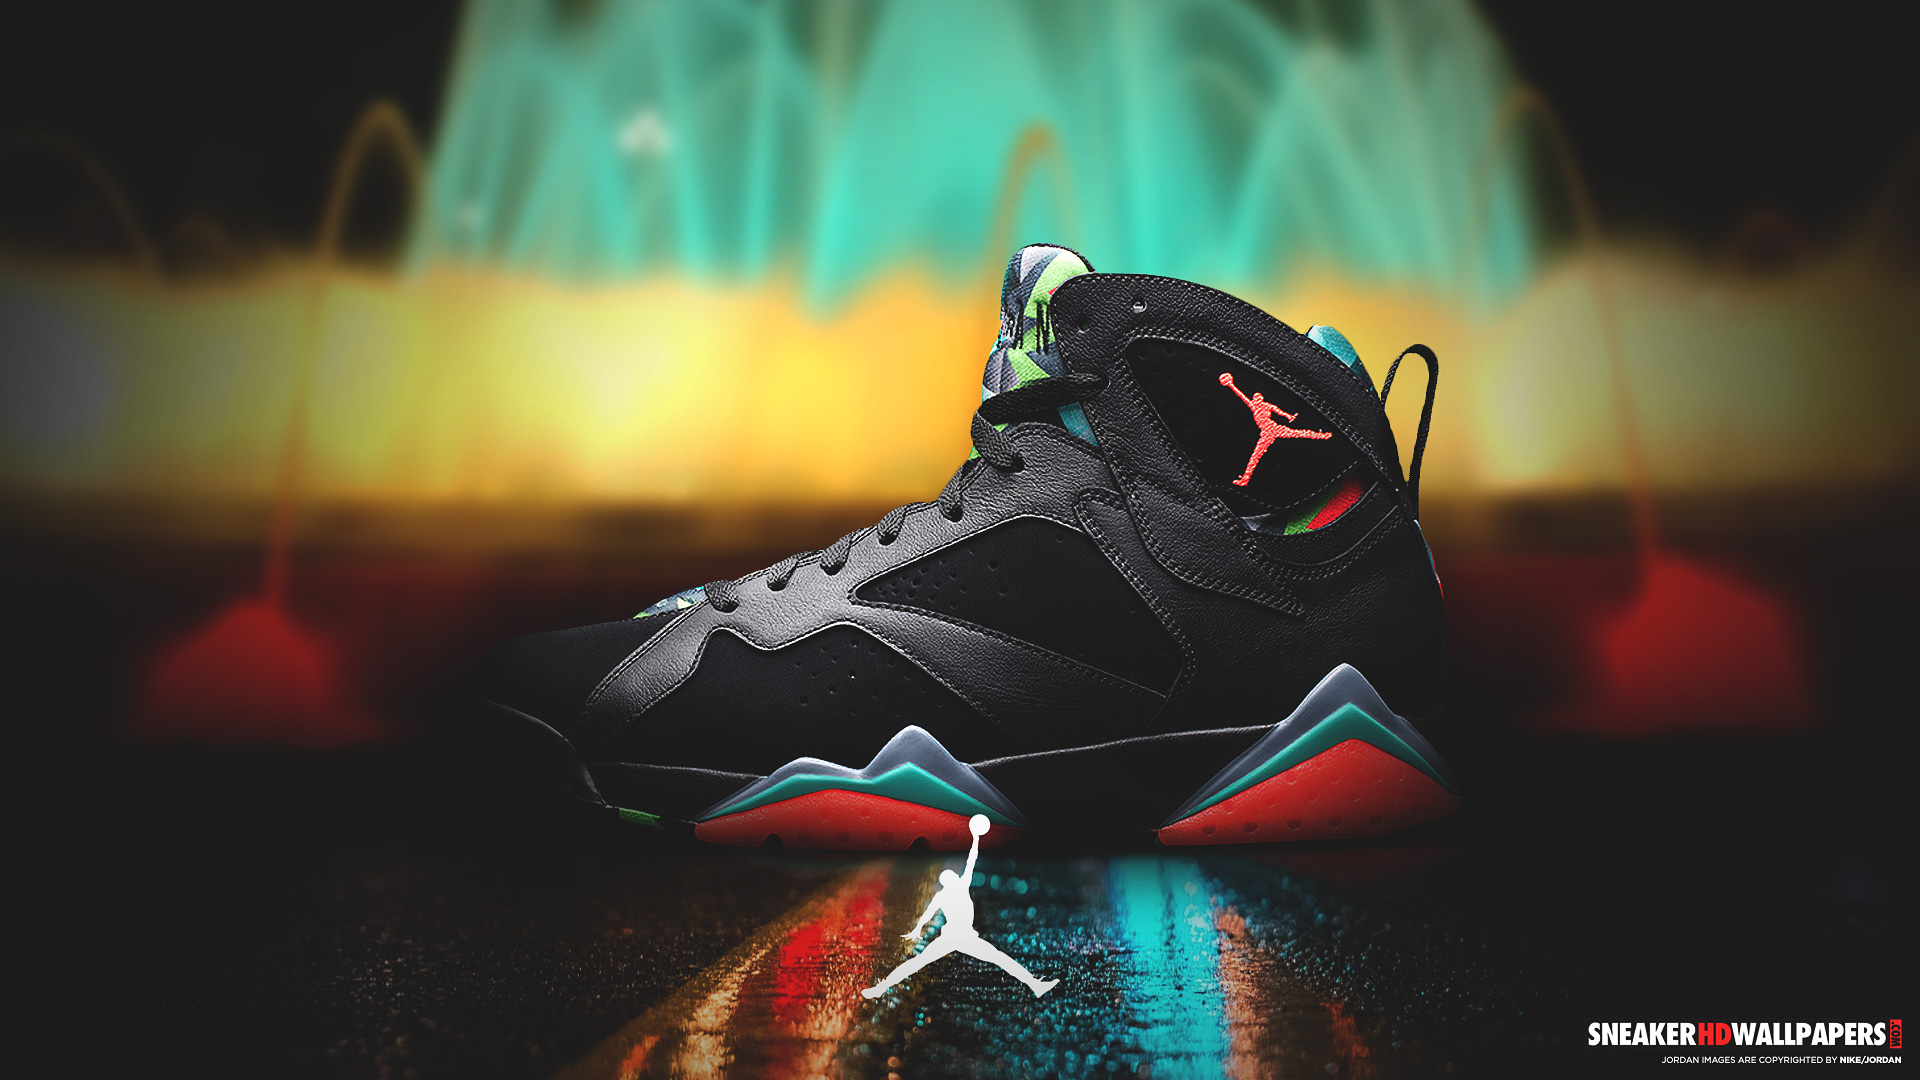 48+ HD Sneaker Wallpapers on WallpaperSafari